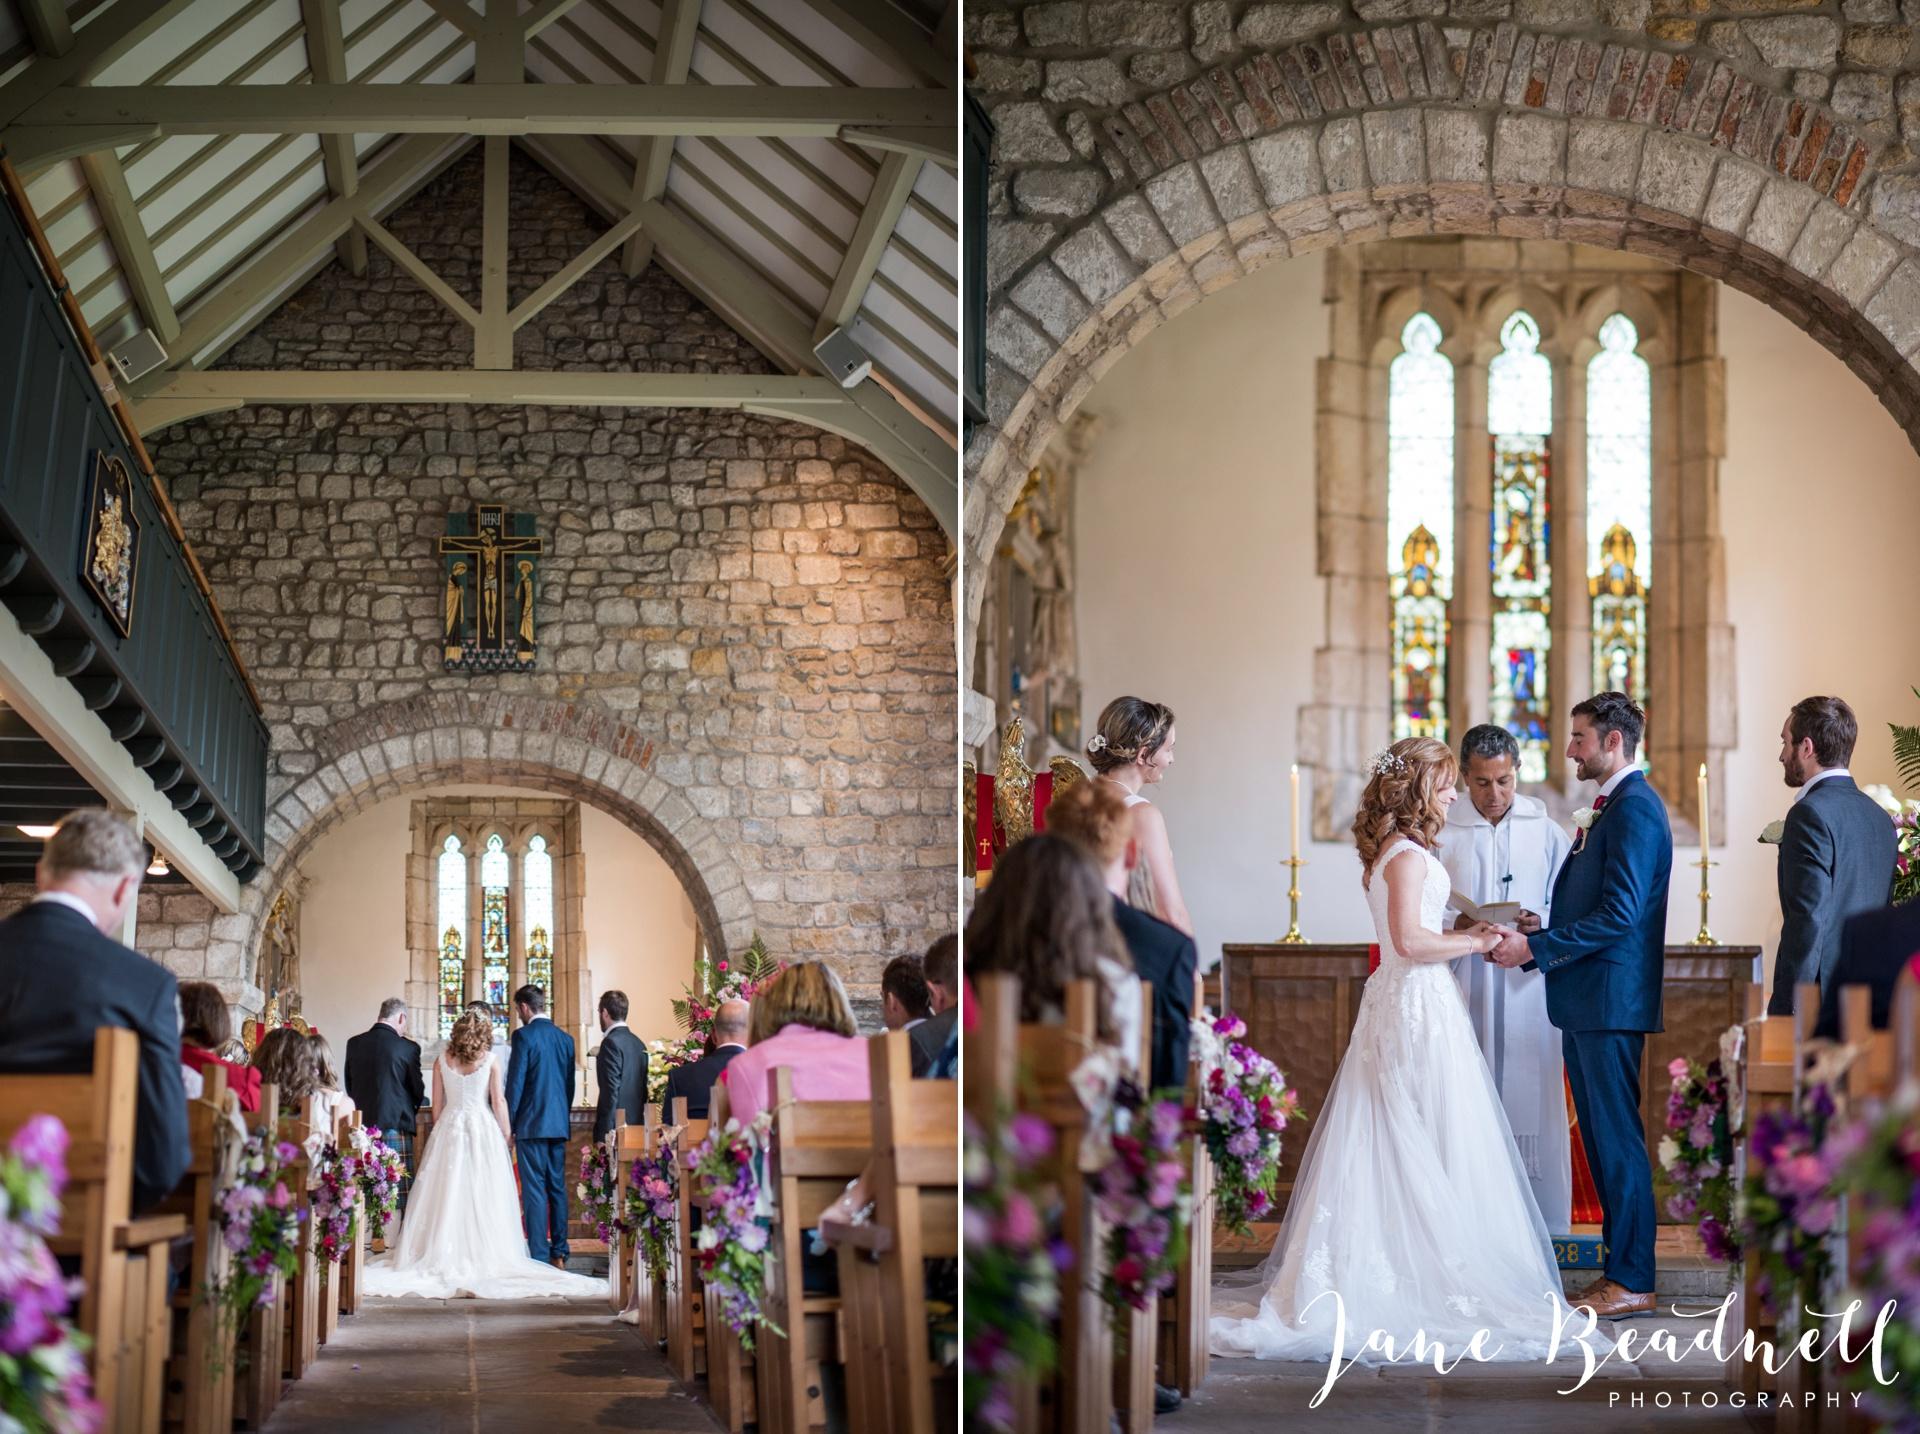 yorkshire-fine-art-wedding-photographer-jane-beadnell-photography-poppleton-york_0048